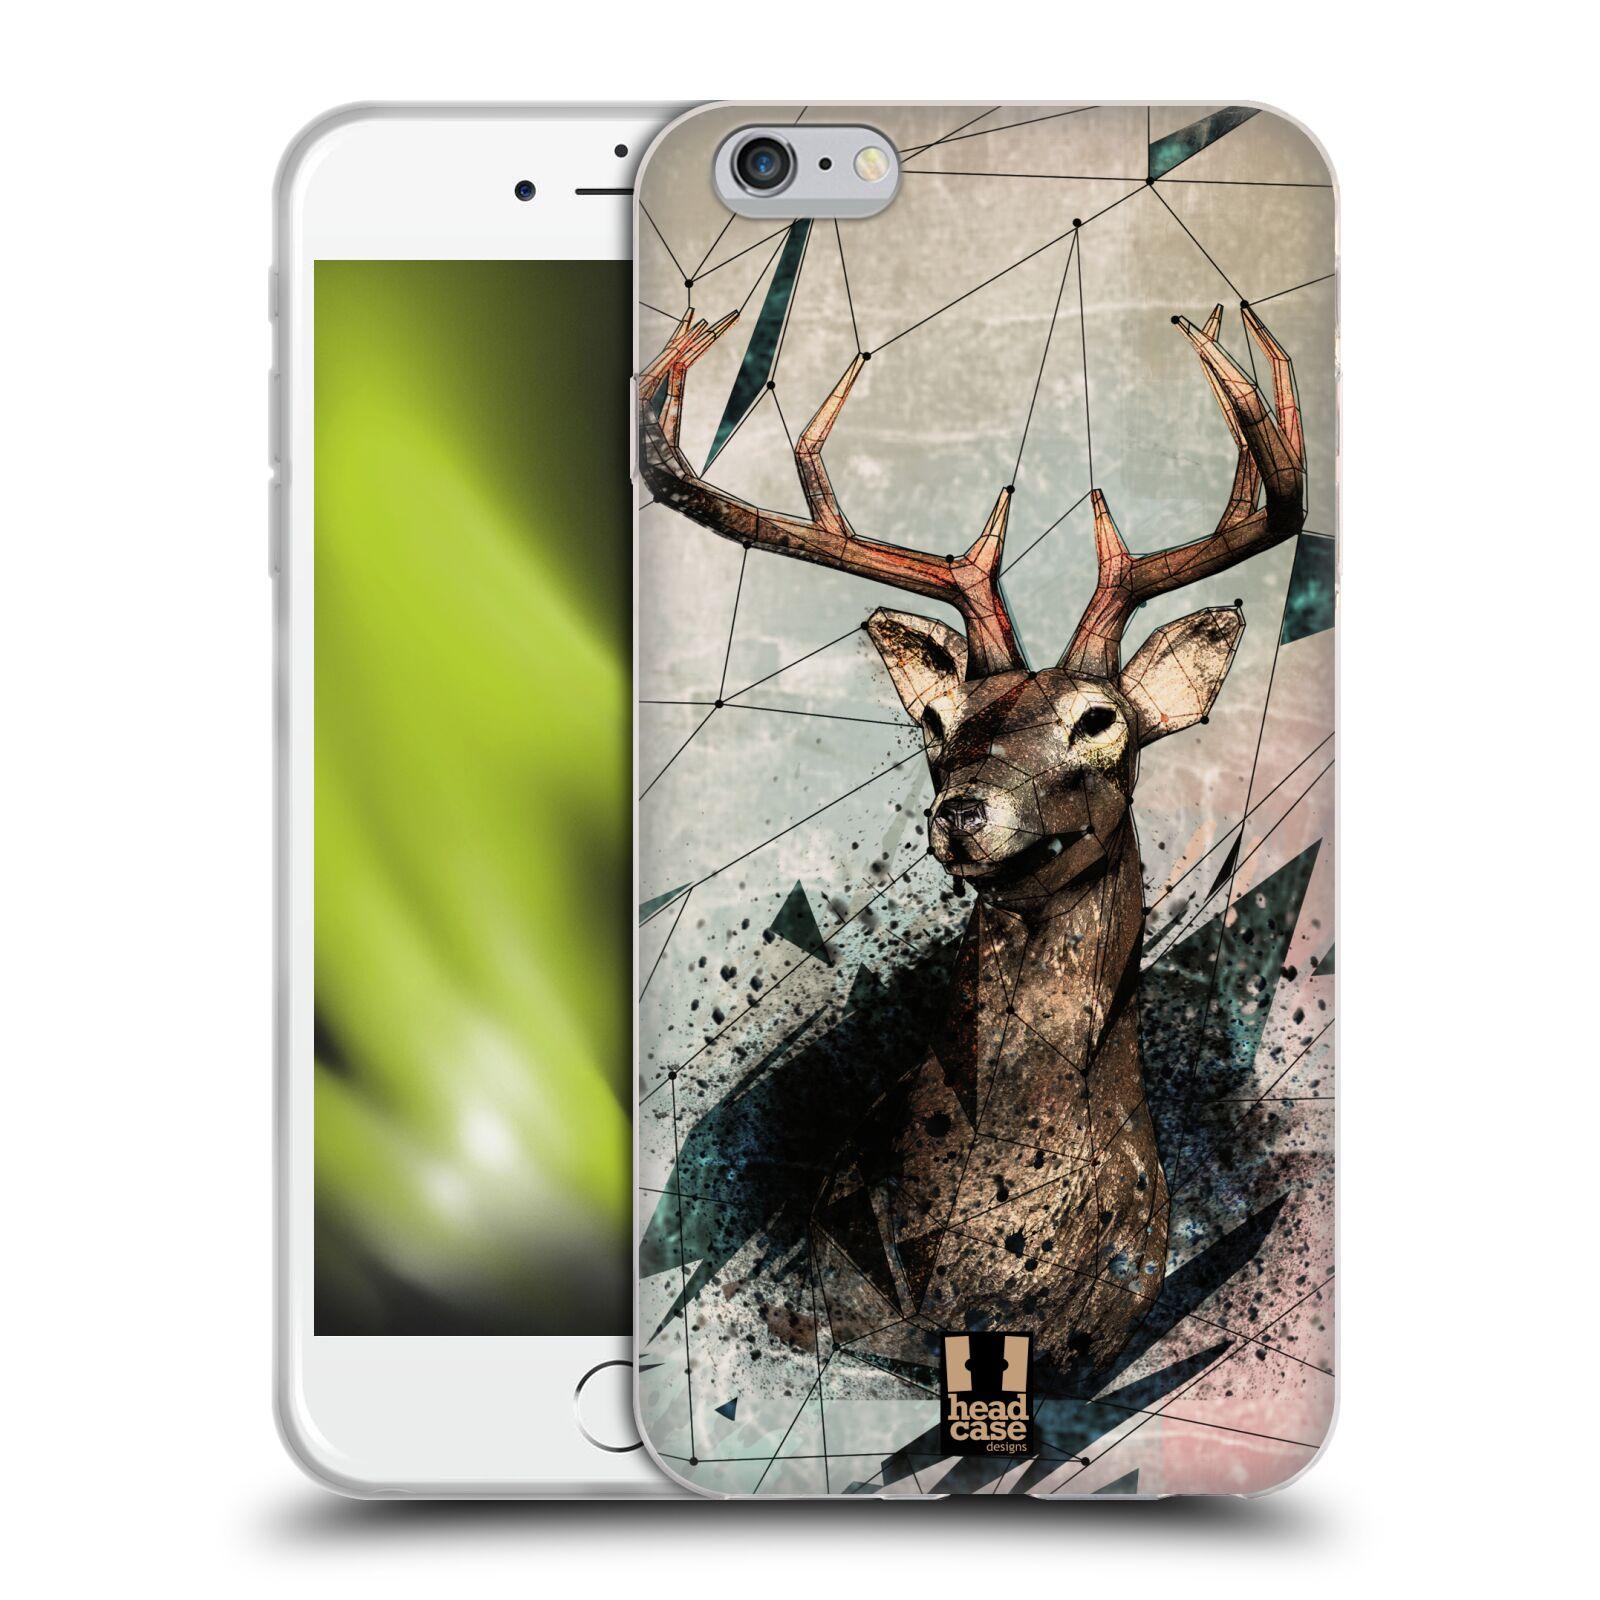 HEAD CASE silikonový obal na mobil Apple Iphone 6 PLUS/ 6S PLUS vzor Skica zvíře kreslené jelen